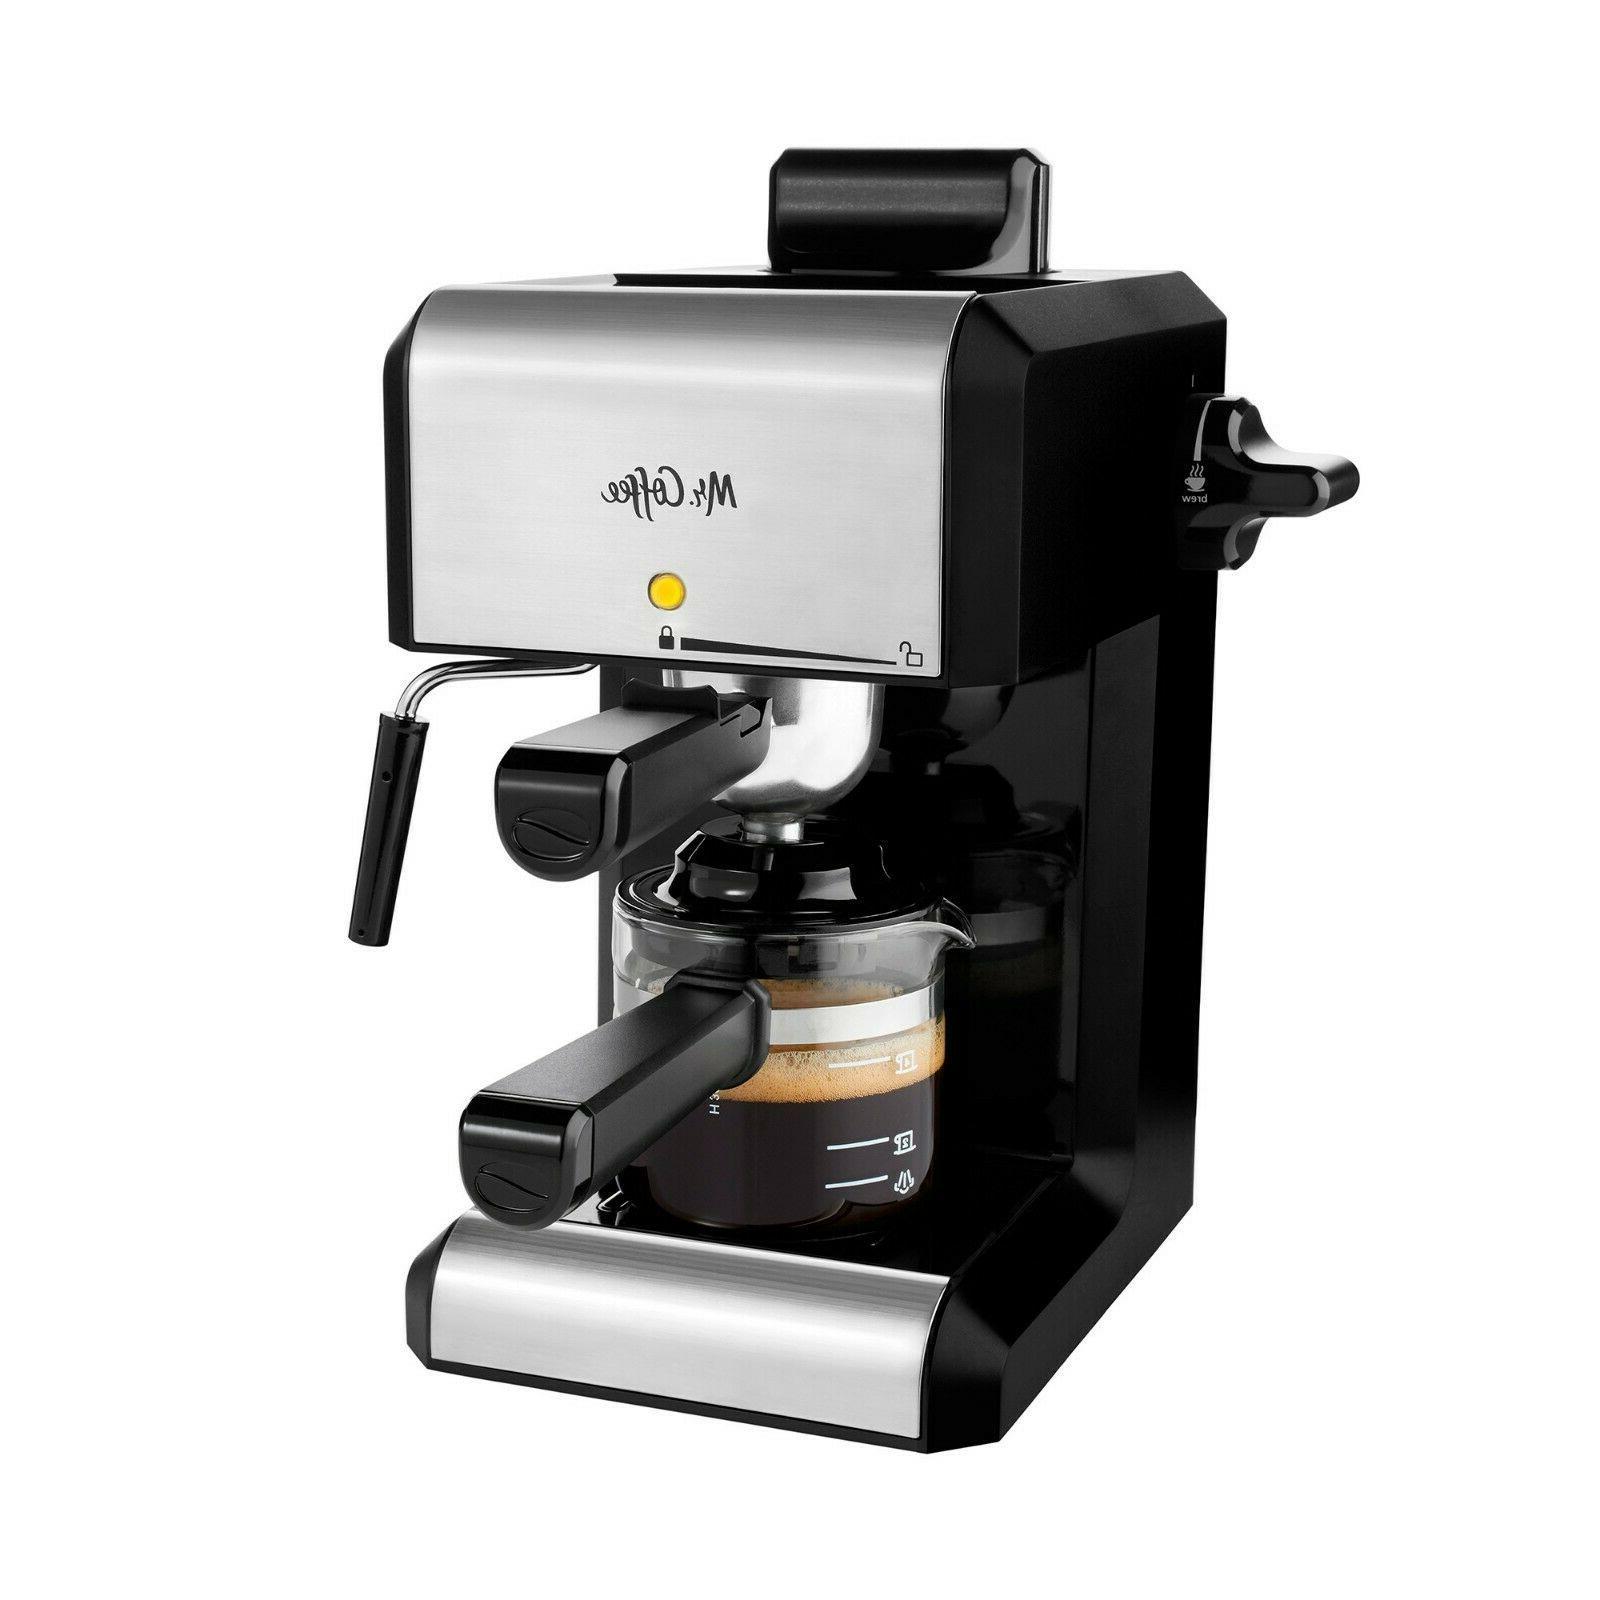 Mr. Coffee Caf 20-Ounce Steam Automatic Espresso and Cappucc